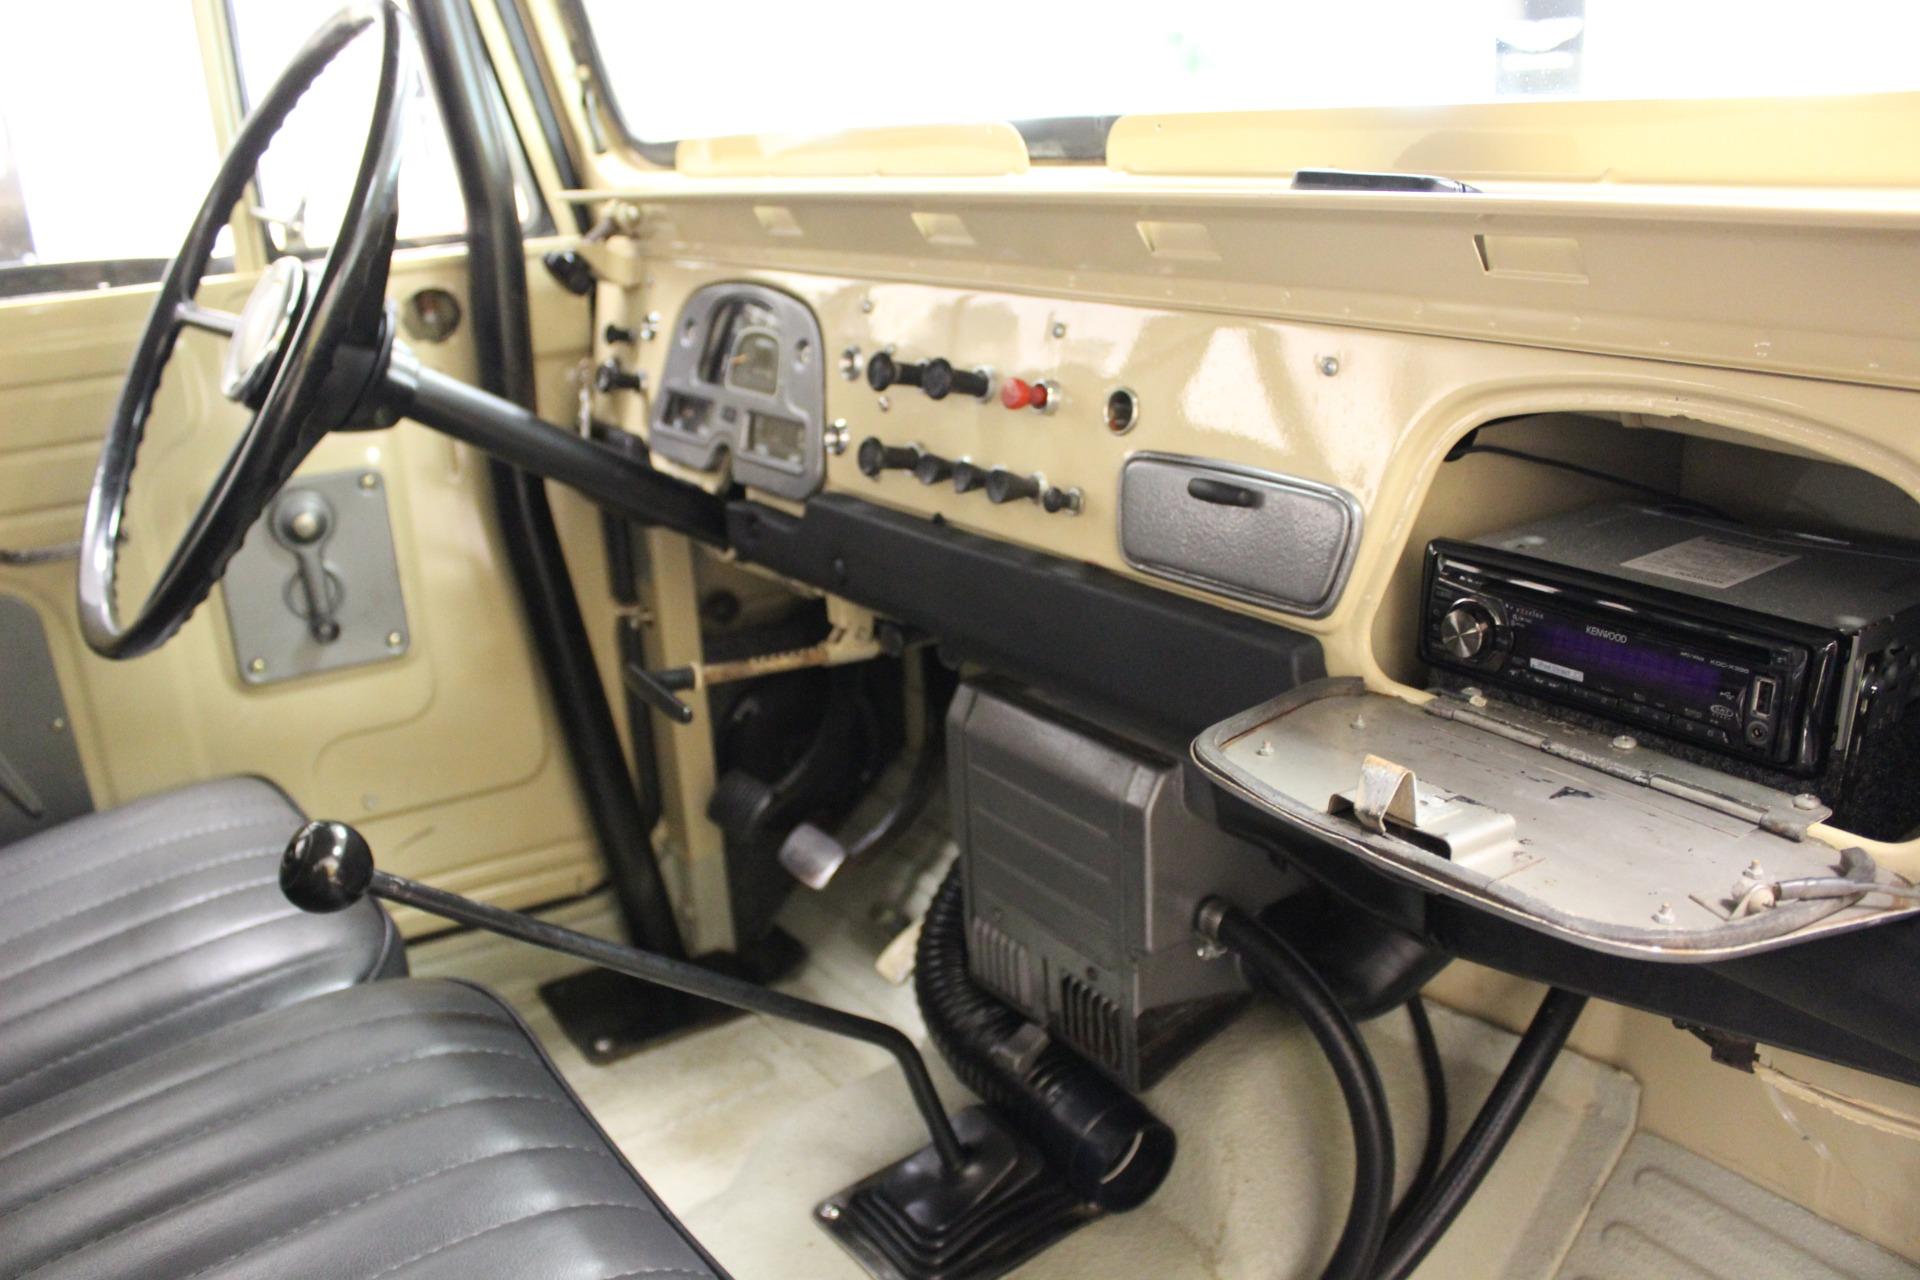 Used 1969 Toyota FJ40 Cruiser Toyota Beige Manual Lifted BF Goodrich  Restored